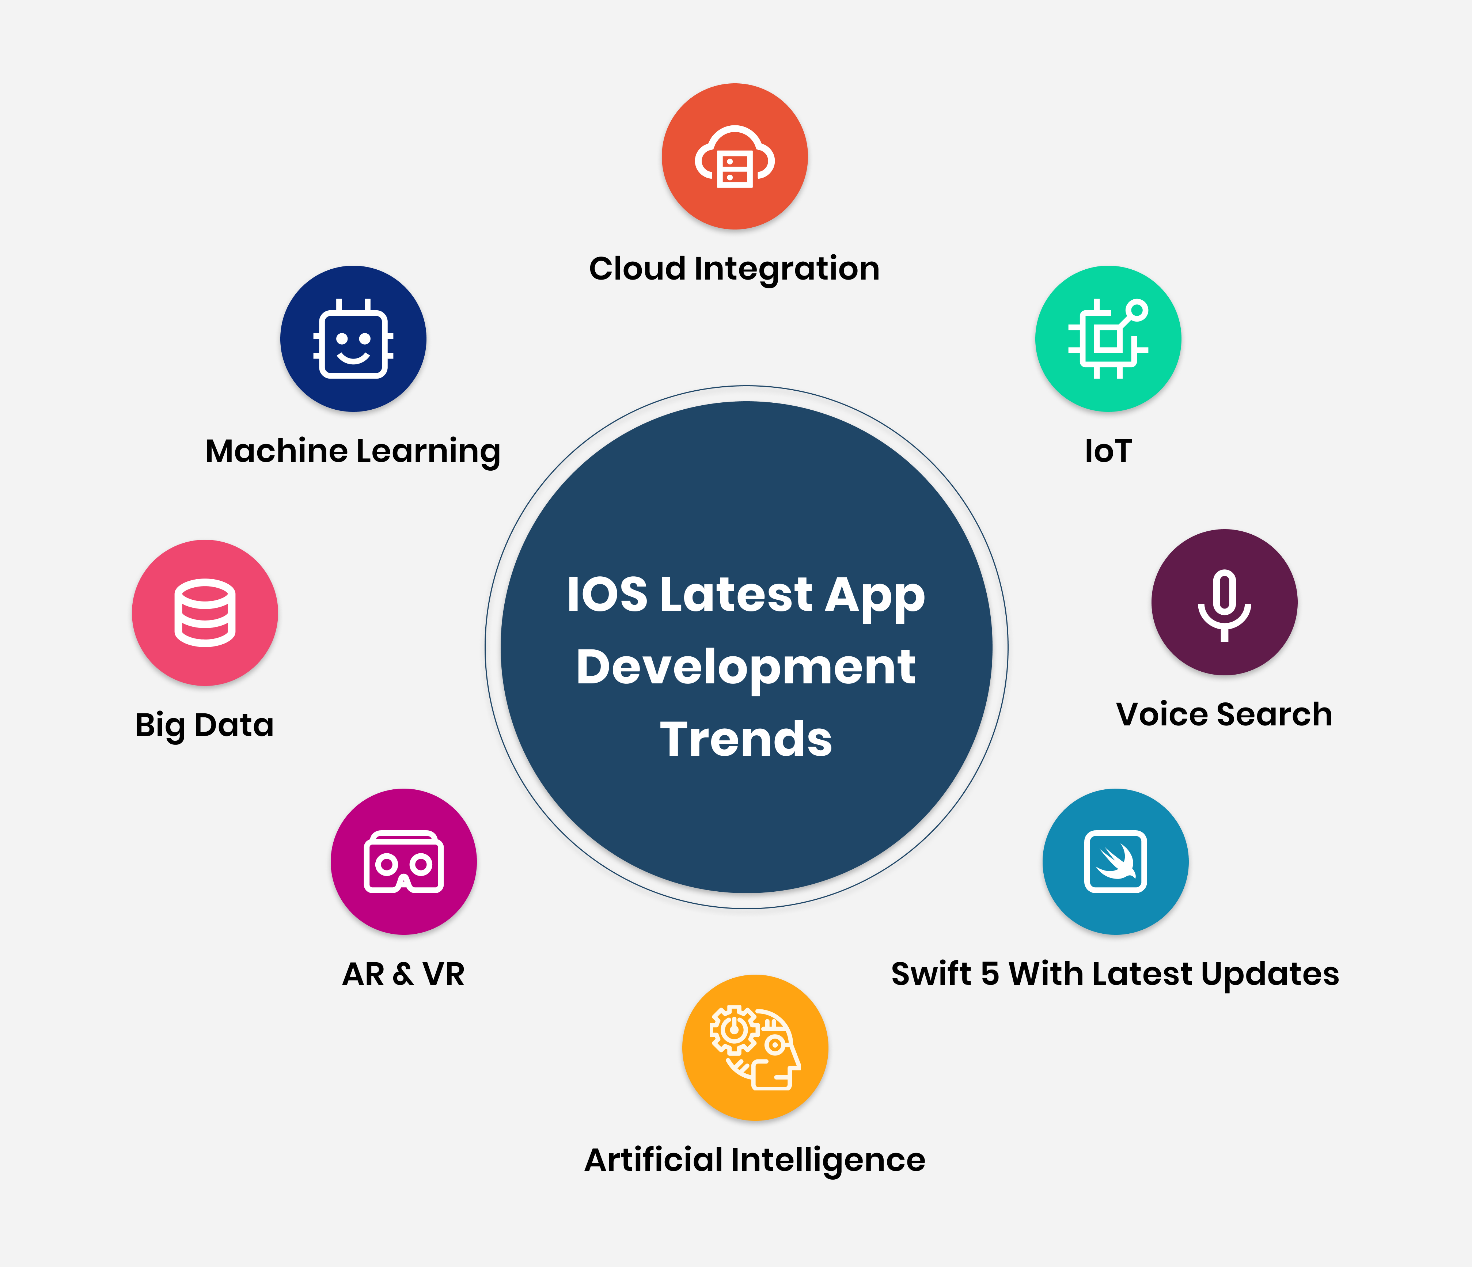 G:\Intuz\Content Plan\Final Content\programming languages for iOS app development\graphics\Graphic7.png